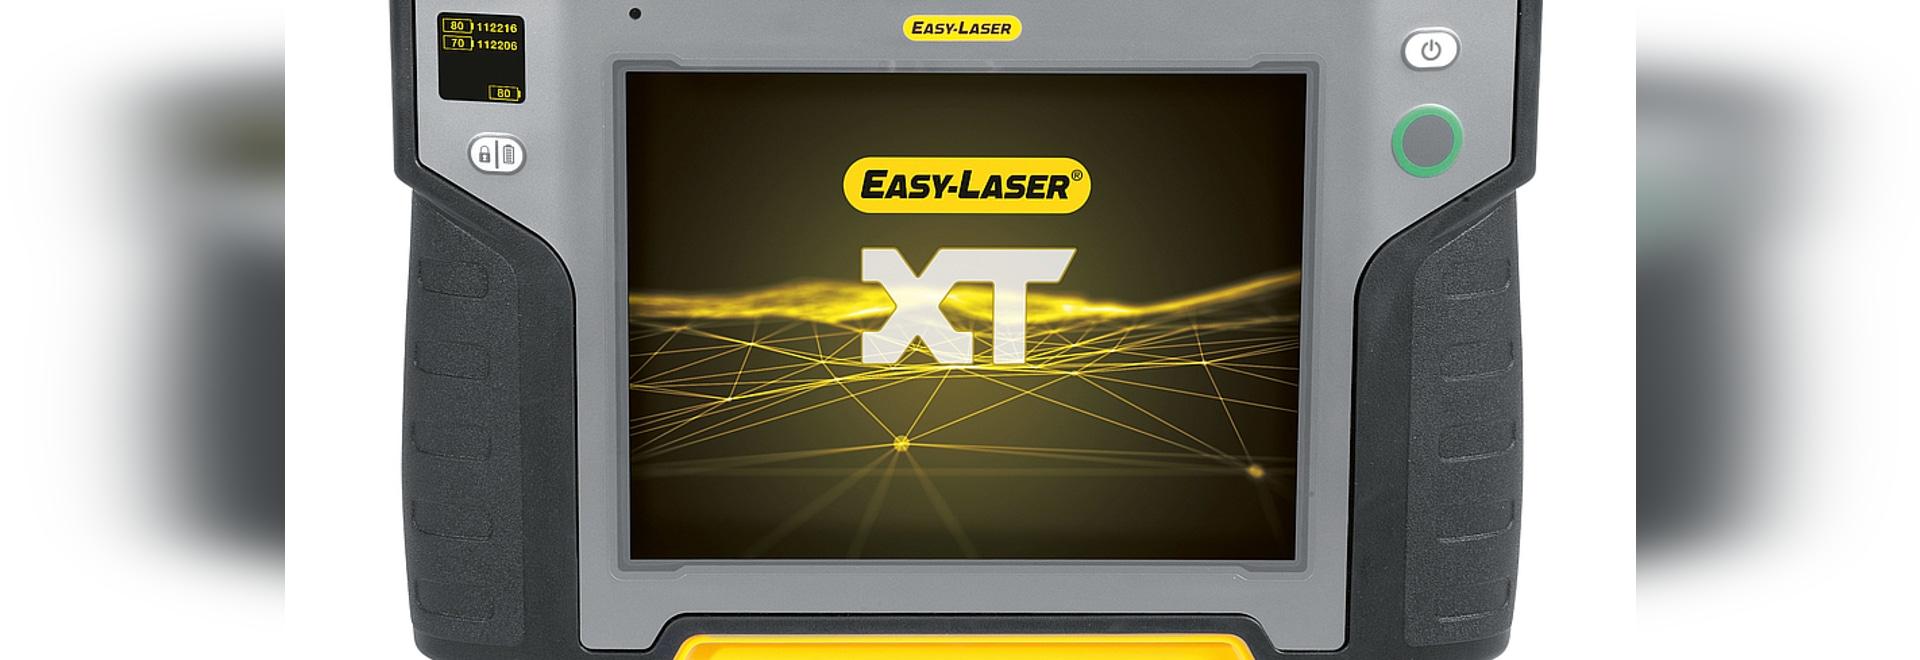 Facile-laser XT11